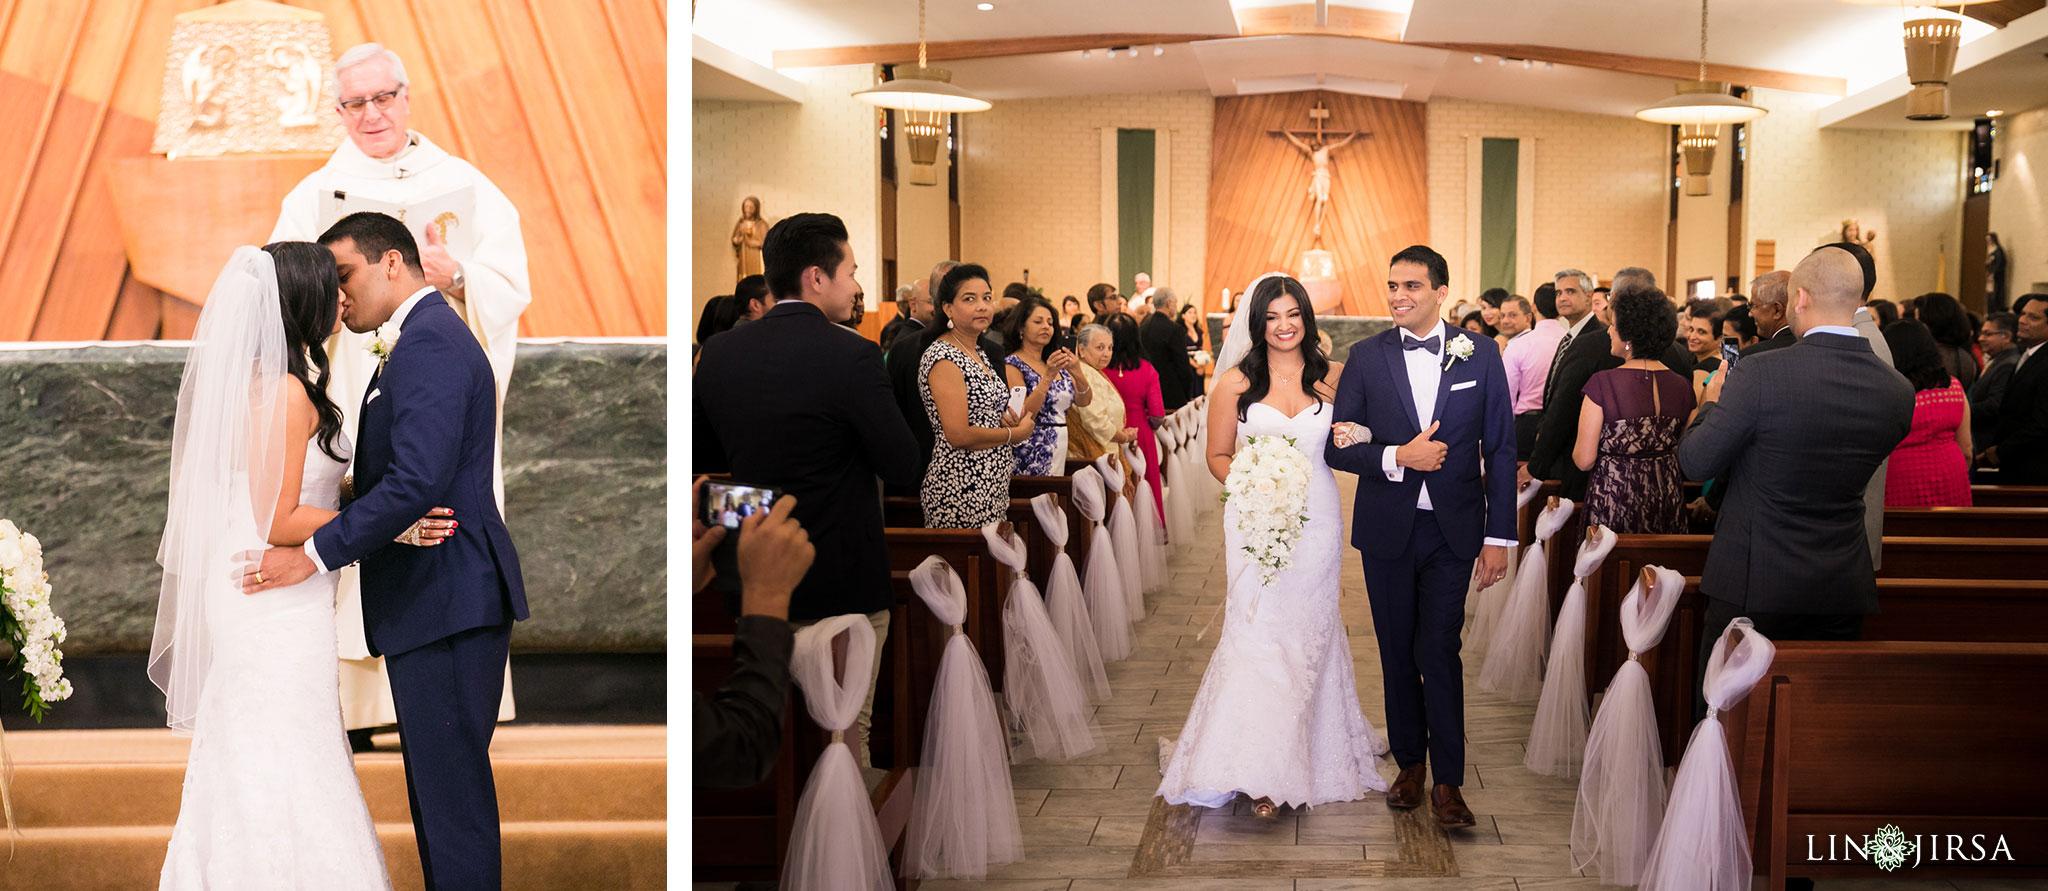 19 St Juliana Falconieri Church Fullerton Wedding Photography